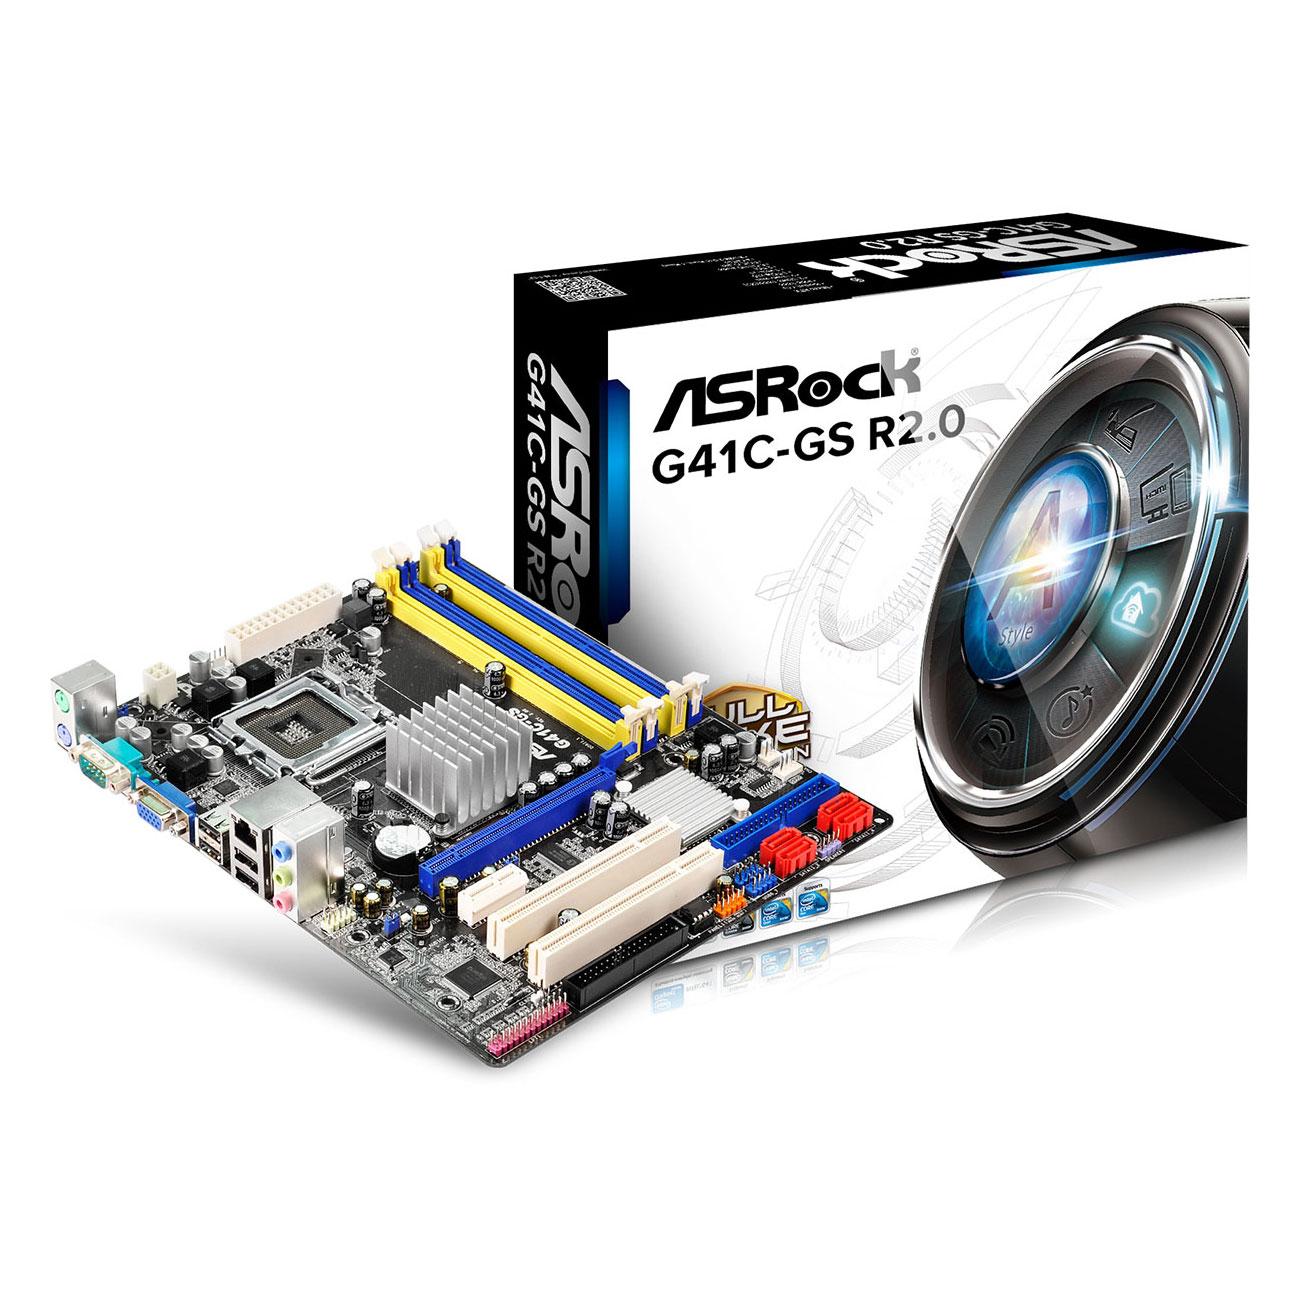 Carte mère ASRock G41C-GS R2.0 Carte mère Micro ATX Intel G41 Express - SATA 3 Gbps - USB 2.0 - 1x PCI-Express 16x